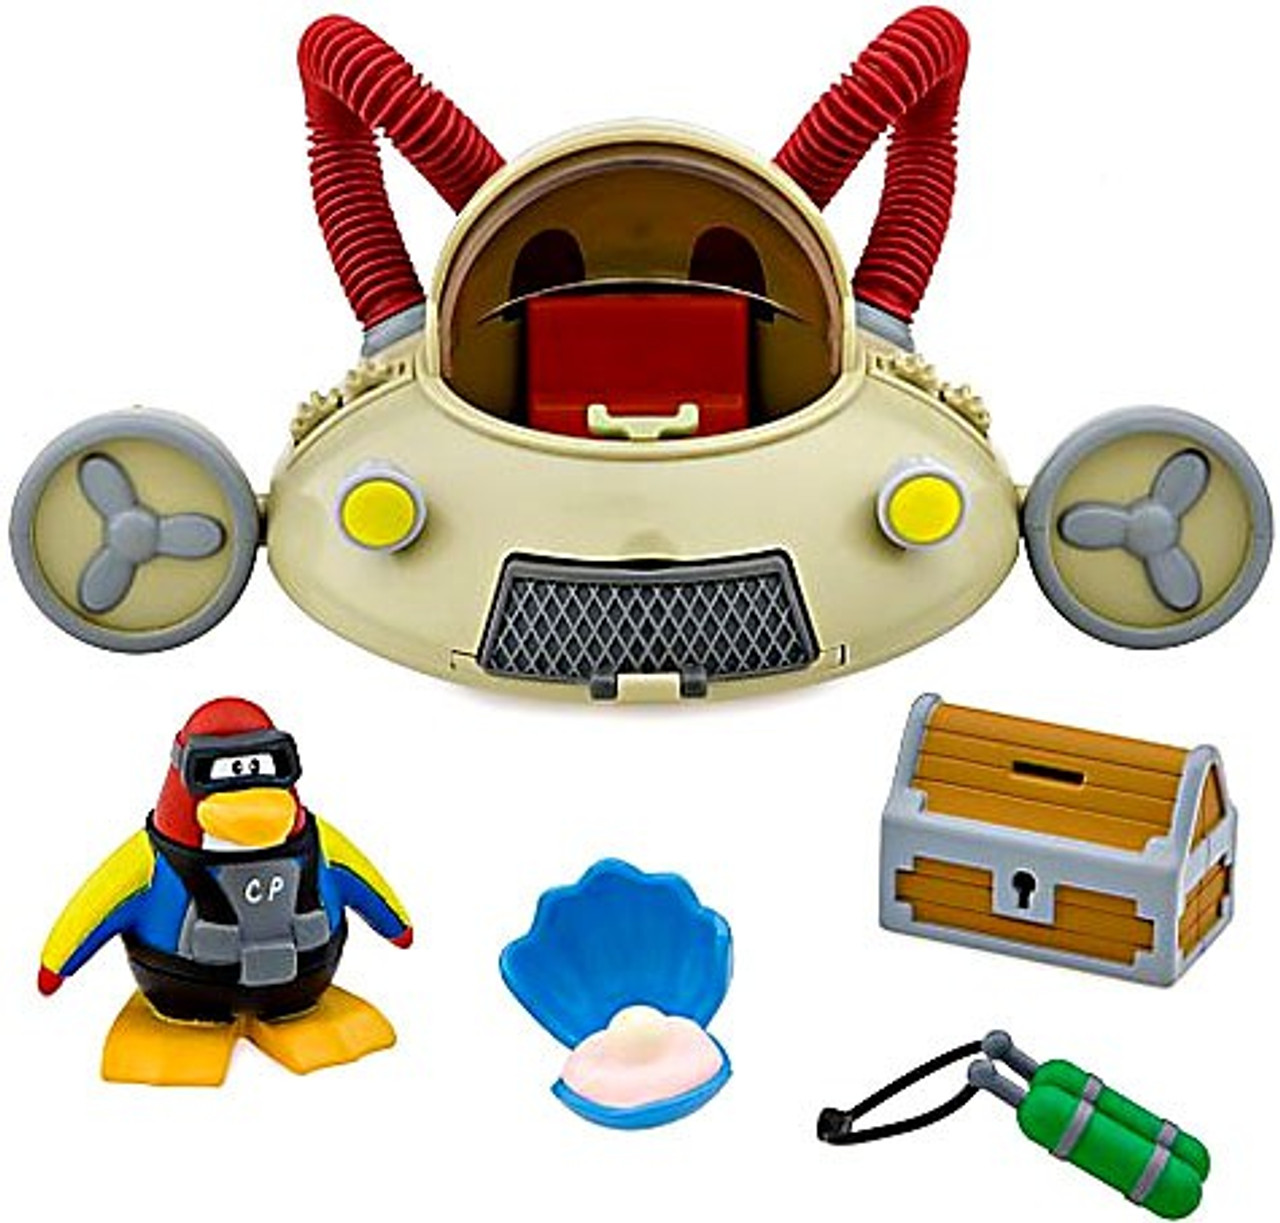 Club Penguin Aqua Grabber Vehicle Vehicle Set